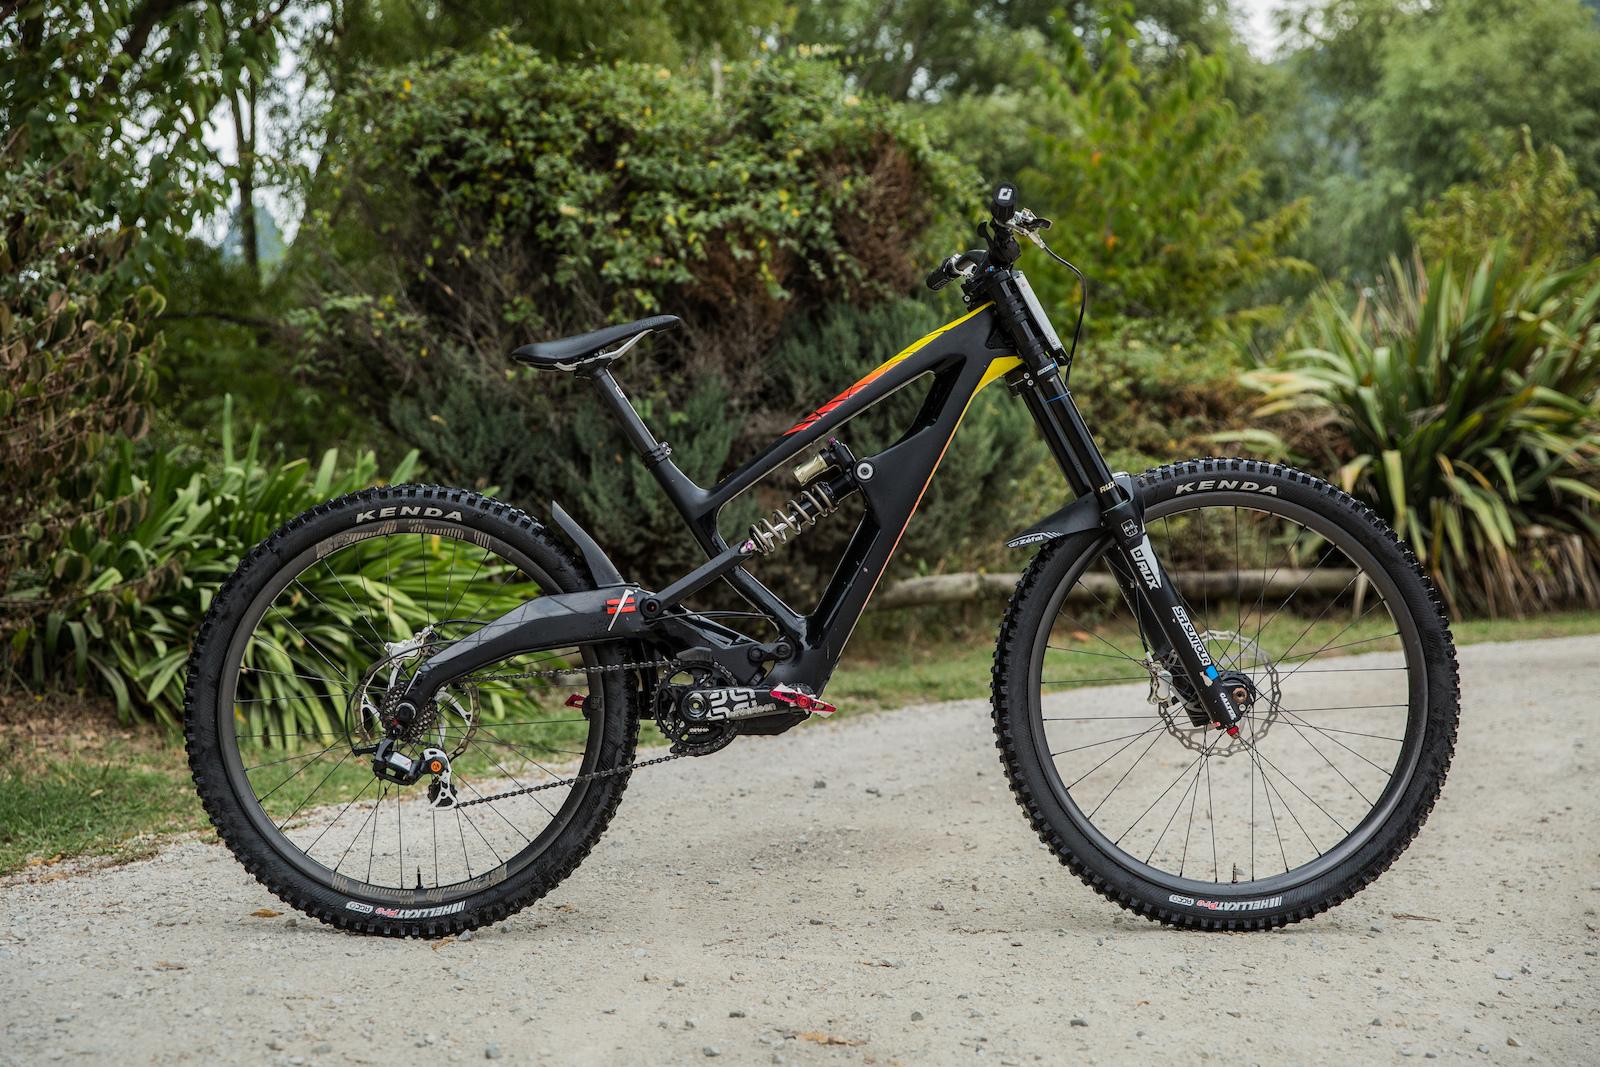 3d74dae9236 Bike Check: Mick Hannah's Mixed Wheel Size Polygon XquarOne DH ...